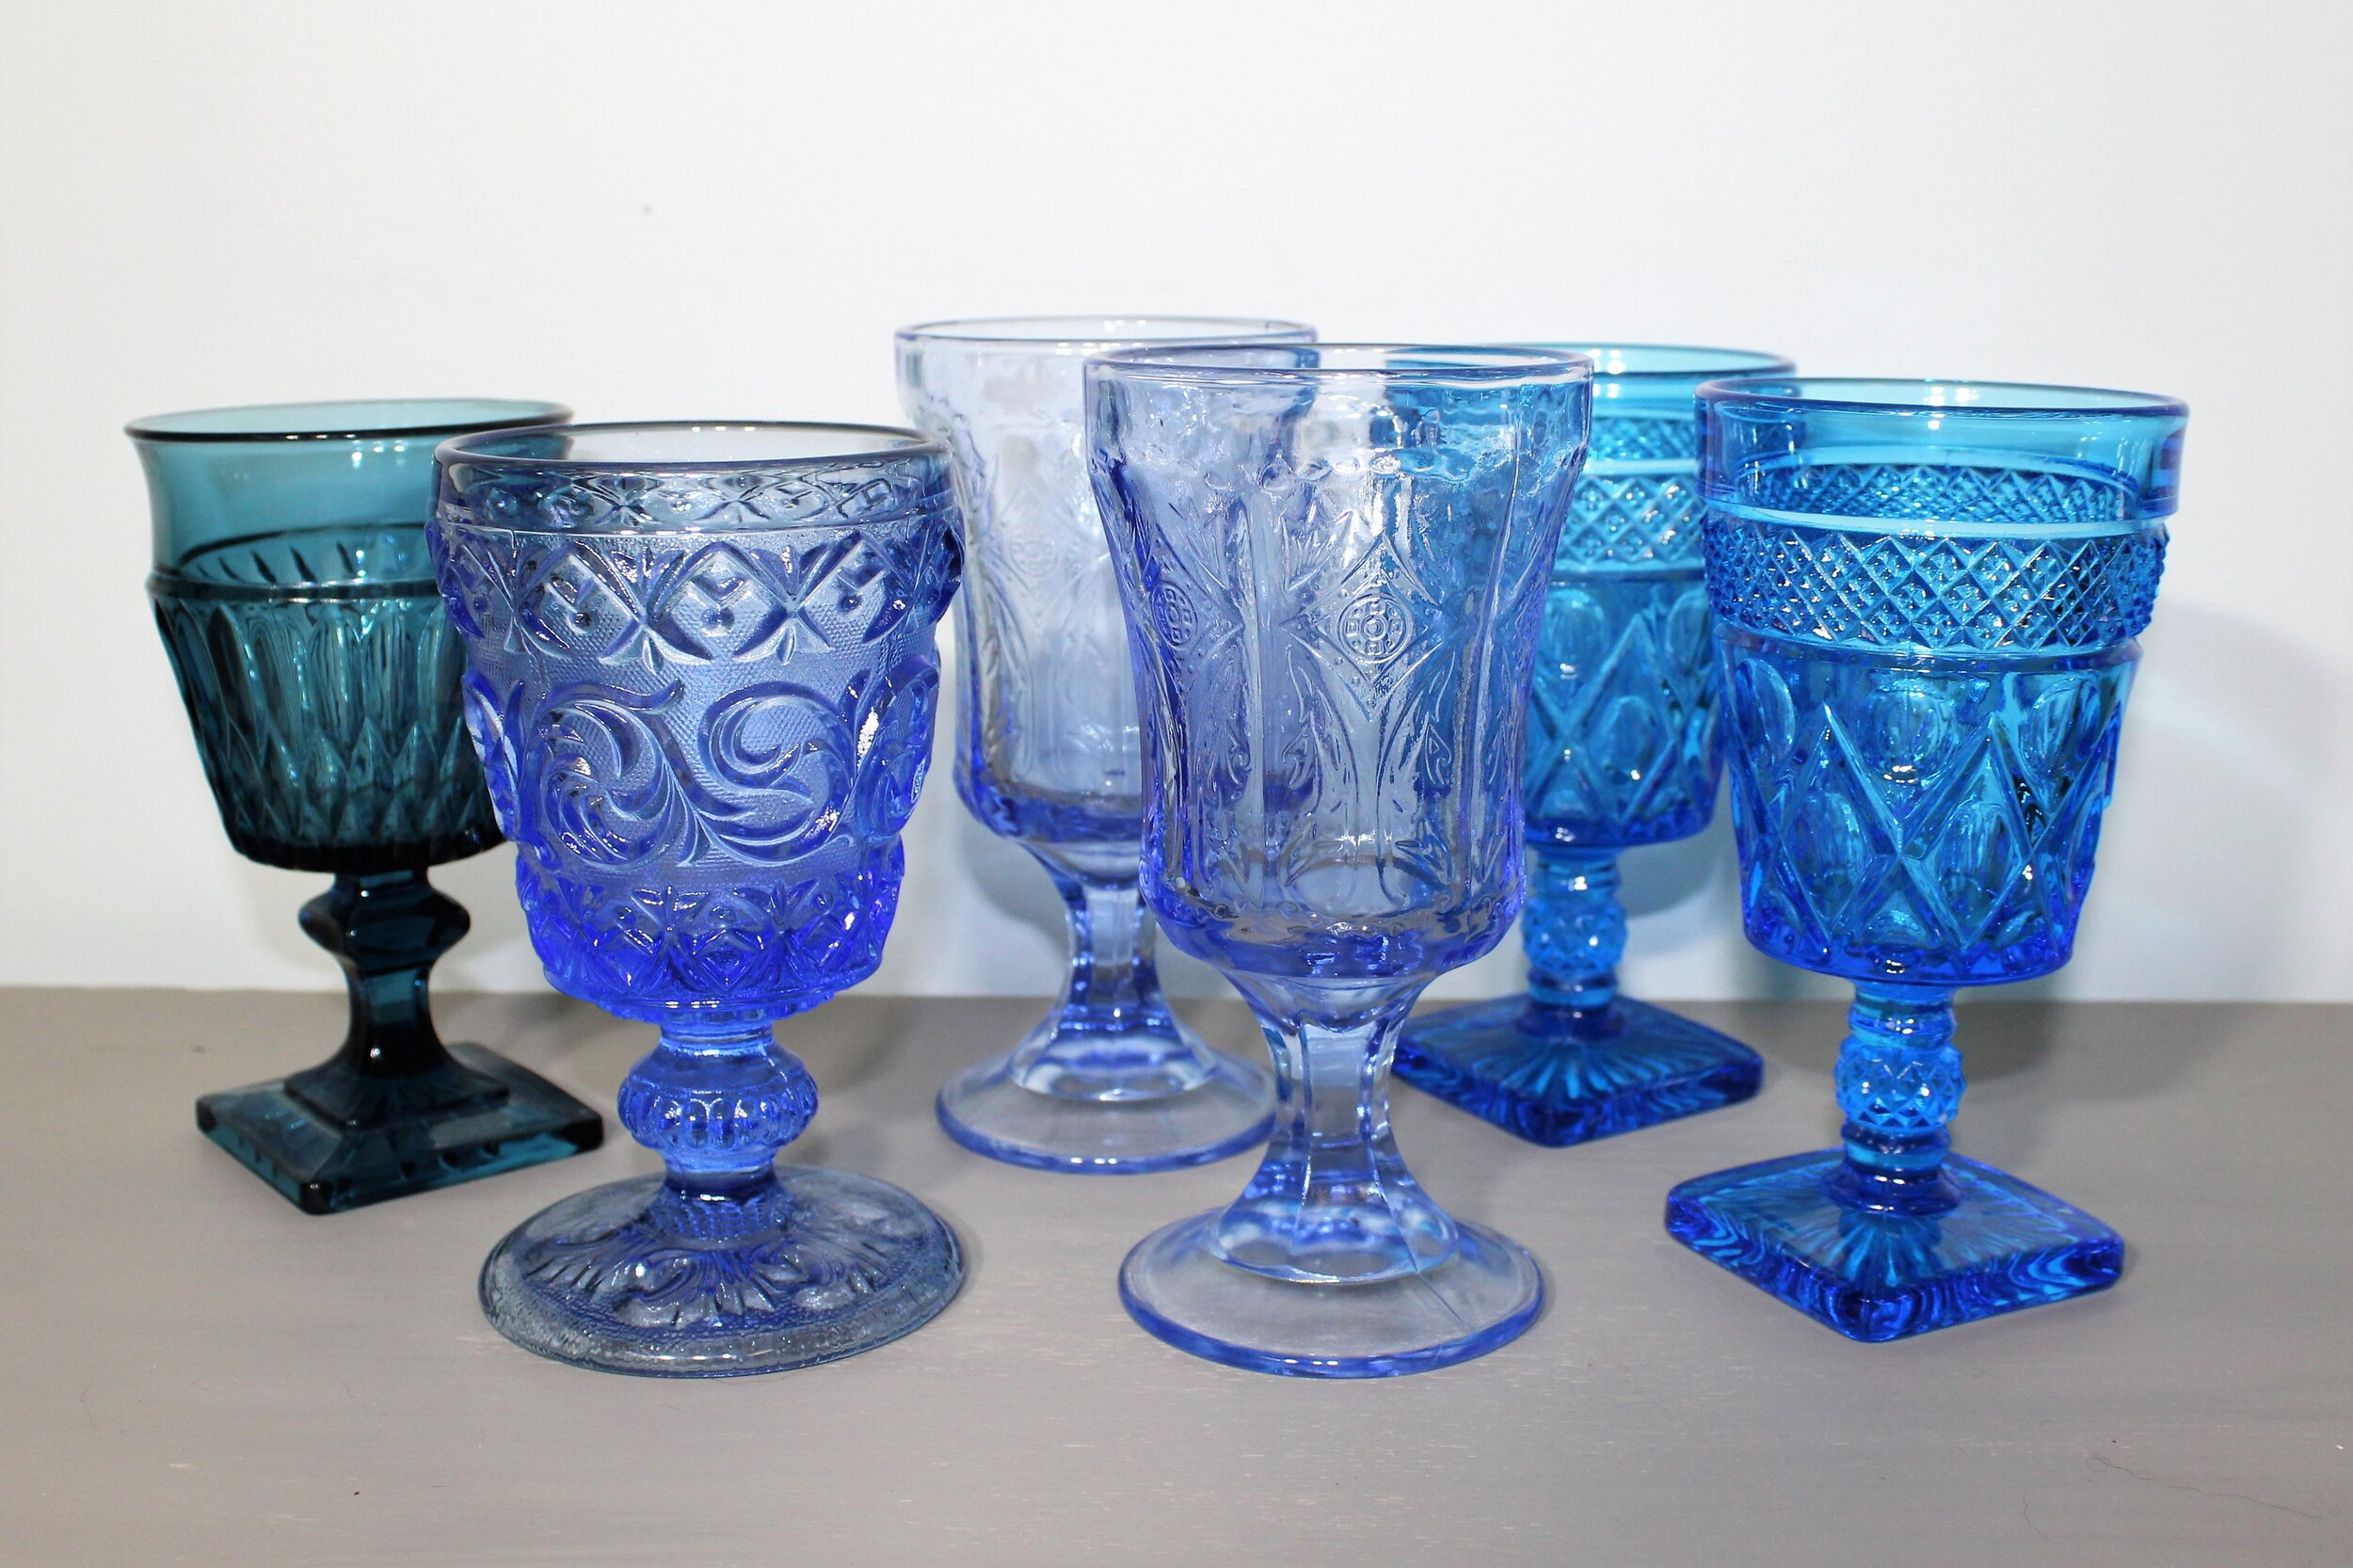 China And Glassware Al R Etc Events, Vintage Blue Glassware